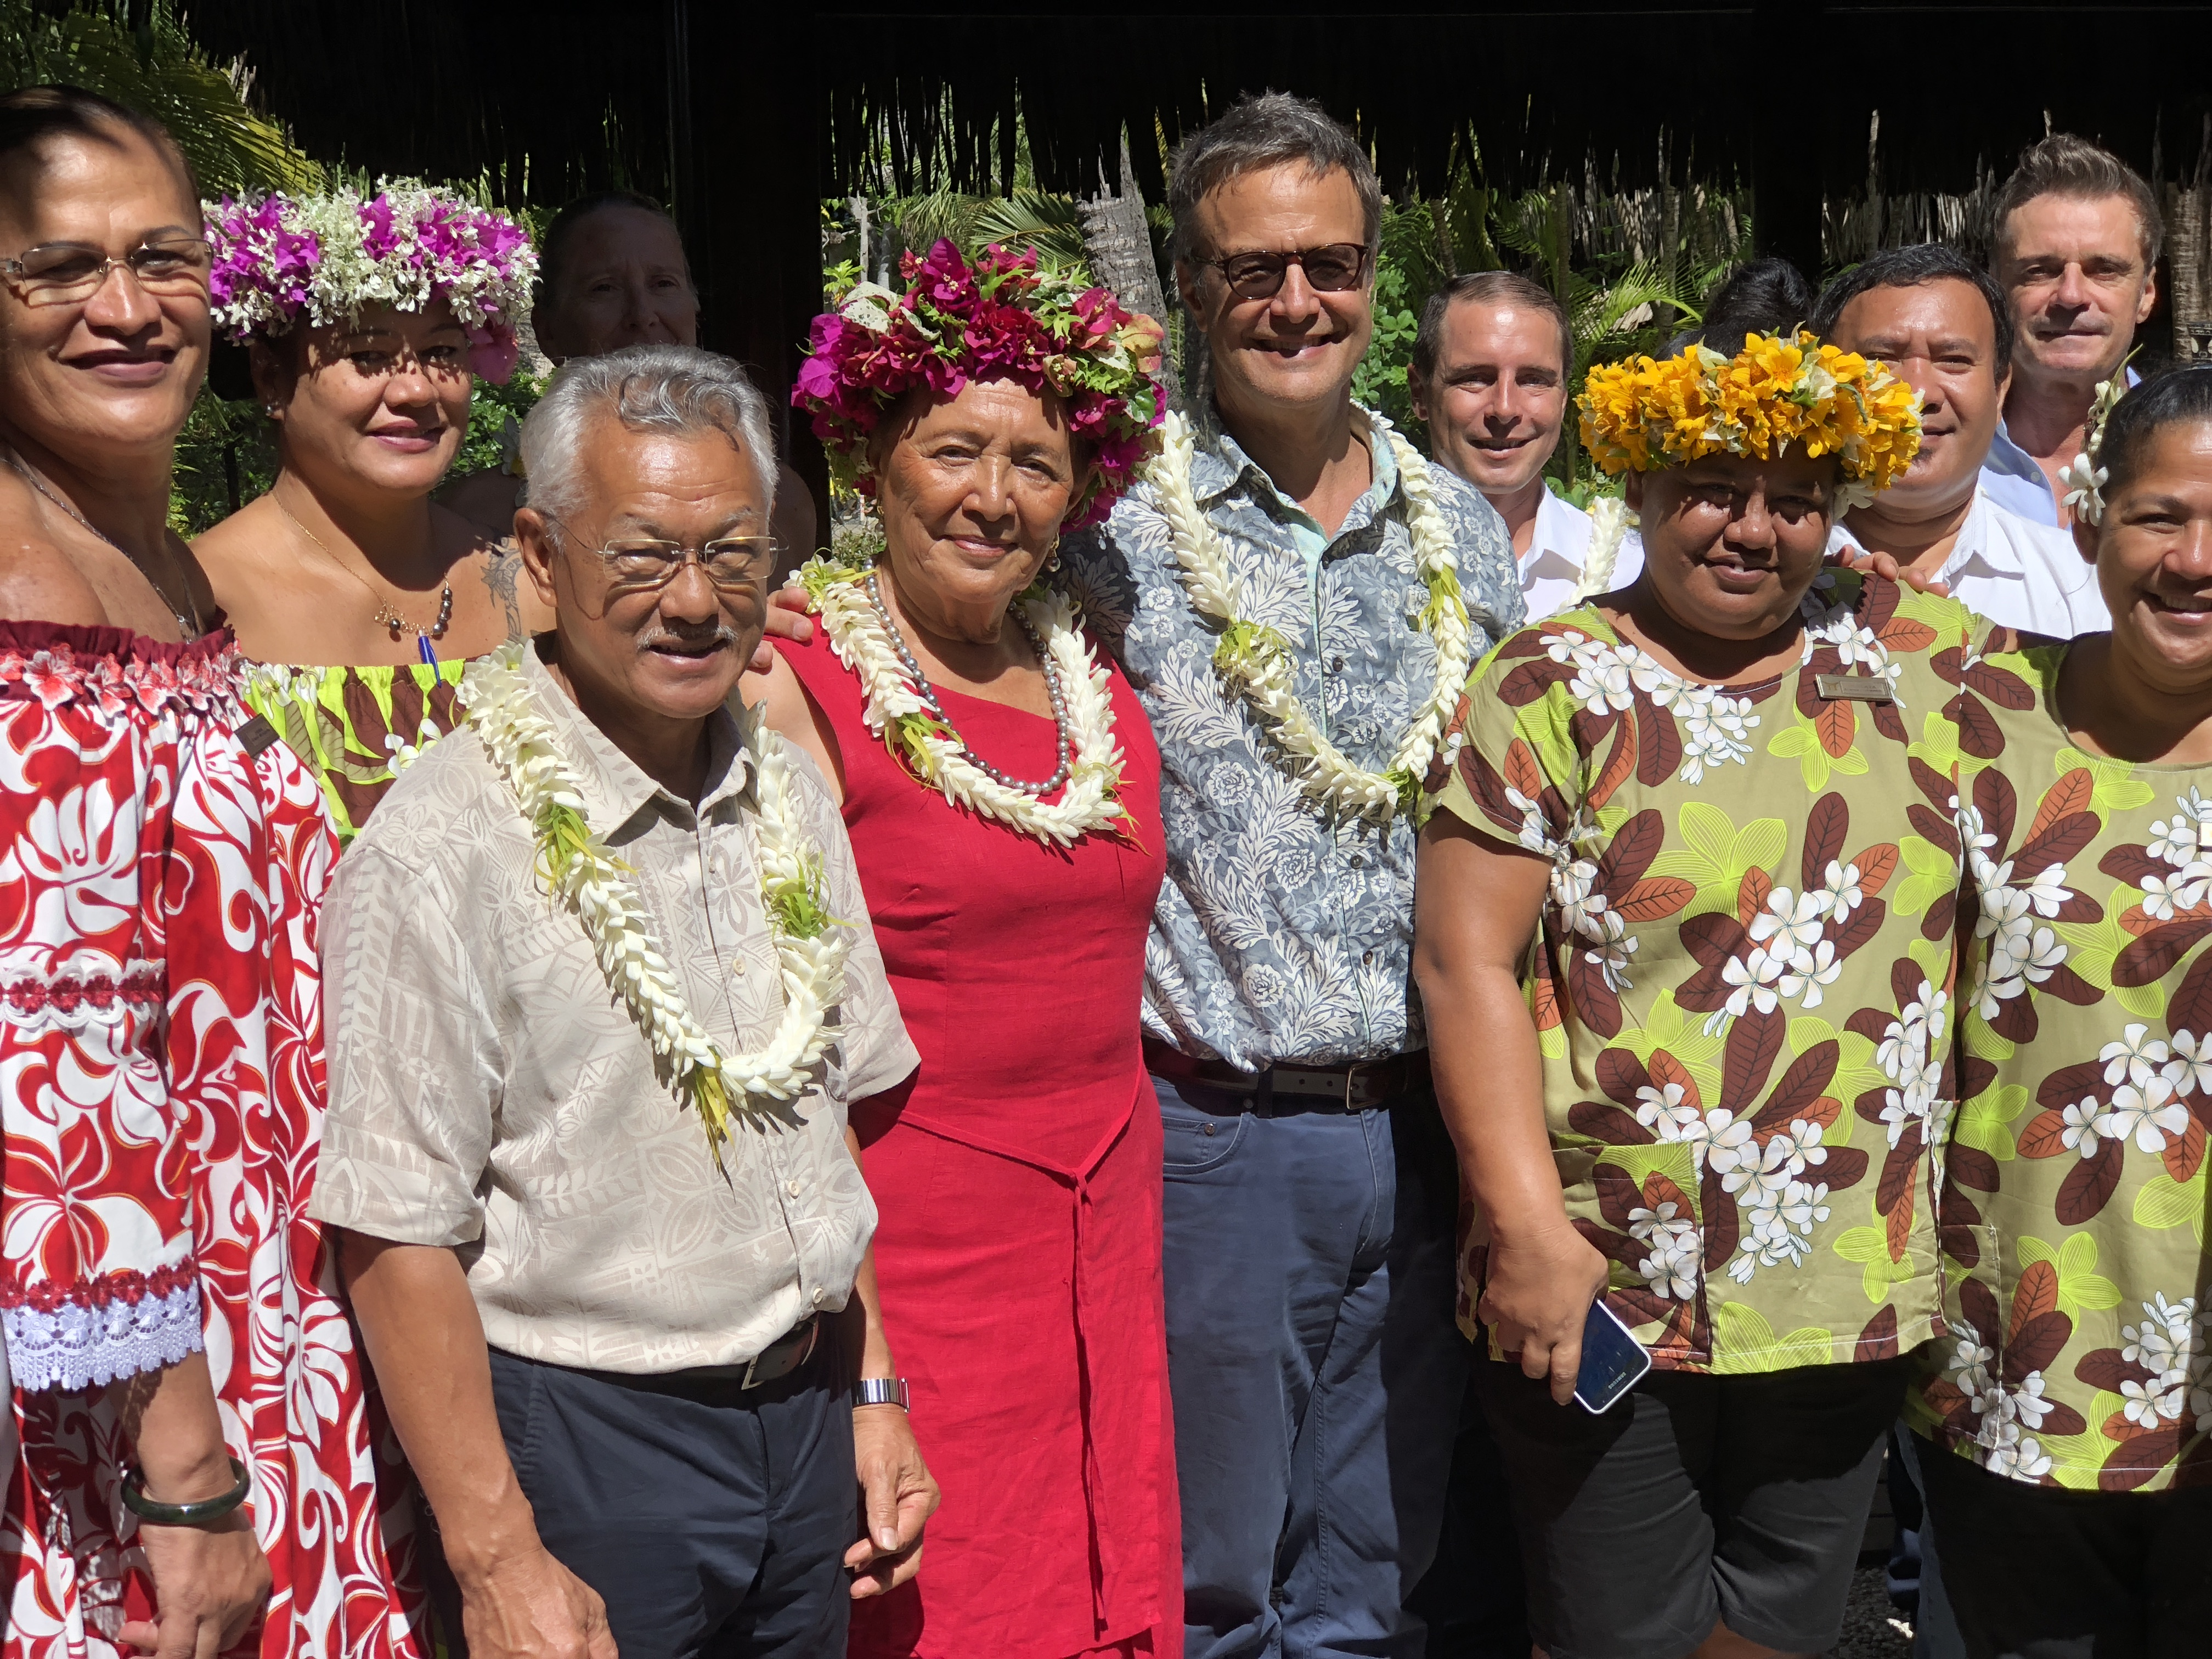 Le Maita'i Bora Bora a fêté ses 20 ans